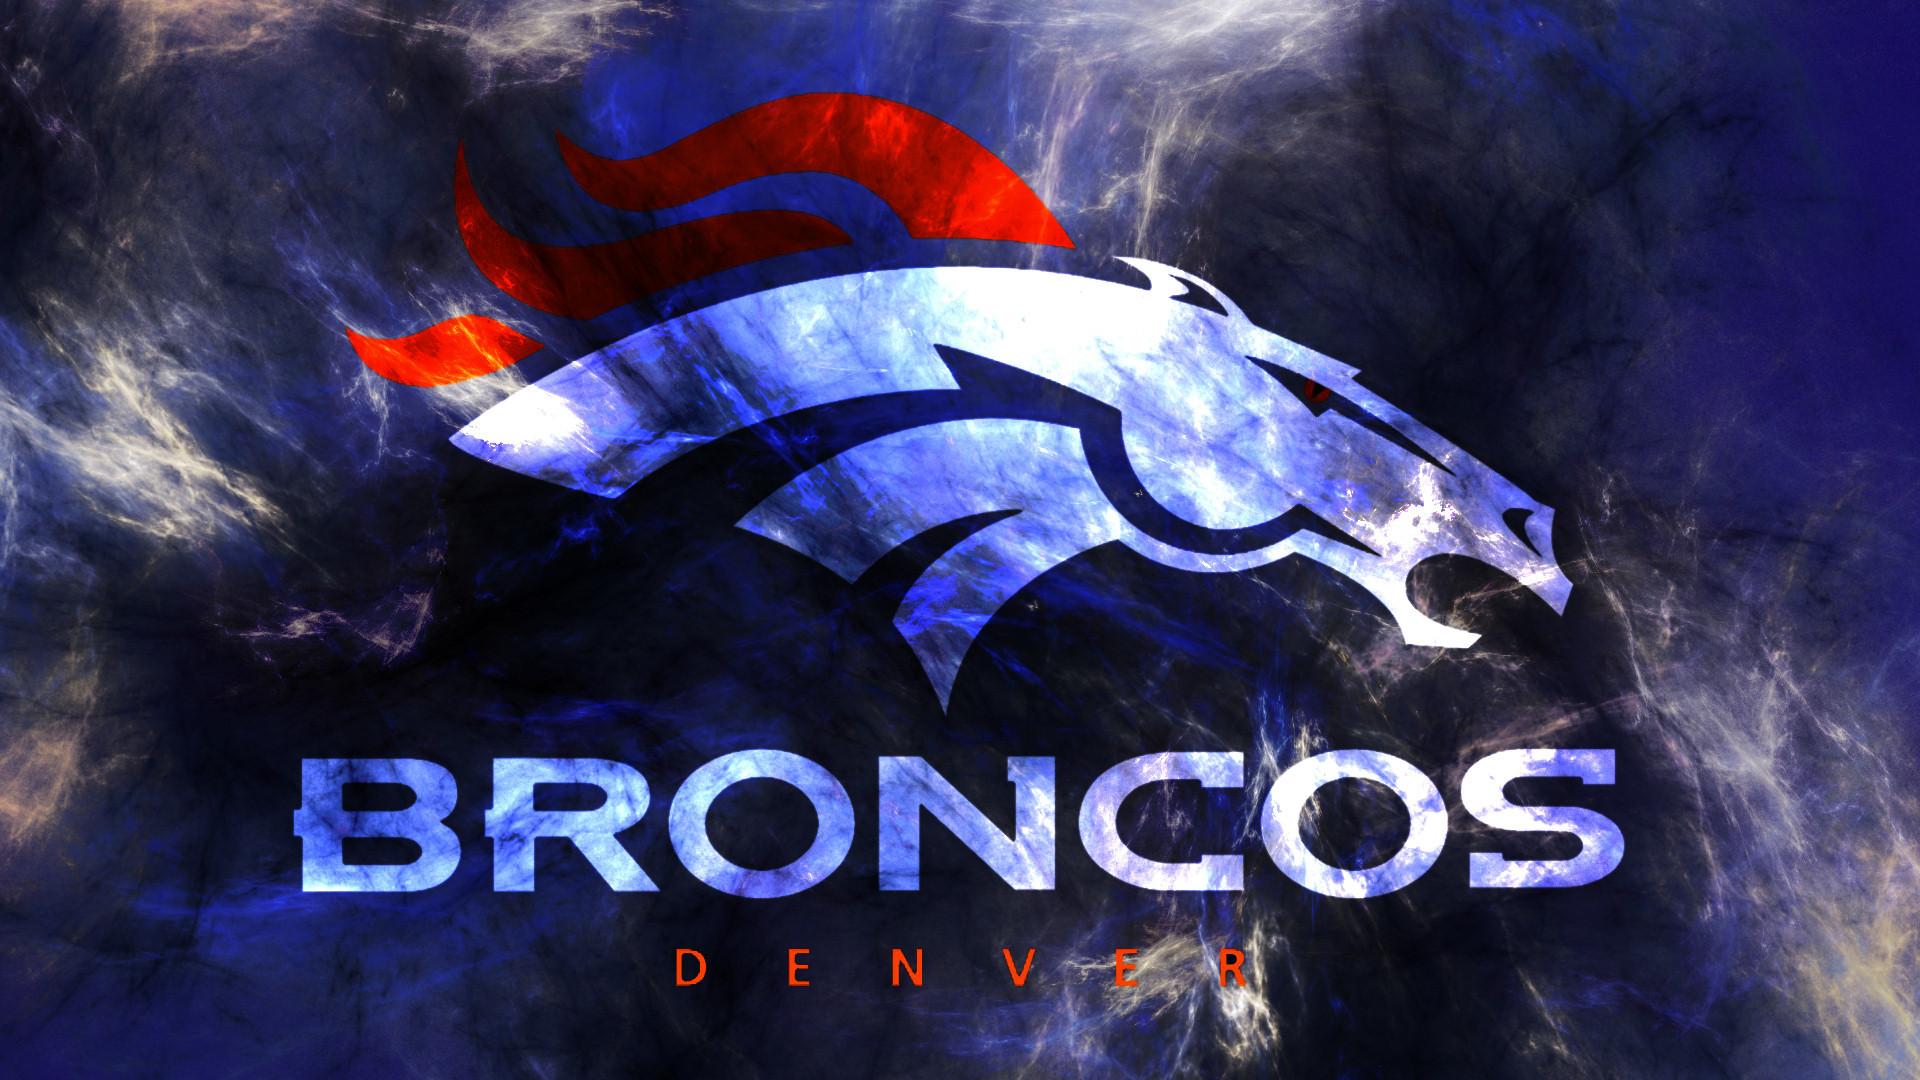 Denver Broncos Vs Carolina Panthers 2016 Super Bowl 50 Wallpapers    Adorable Wallpapers   Pinterest   Wallpaper